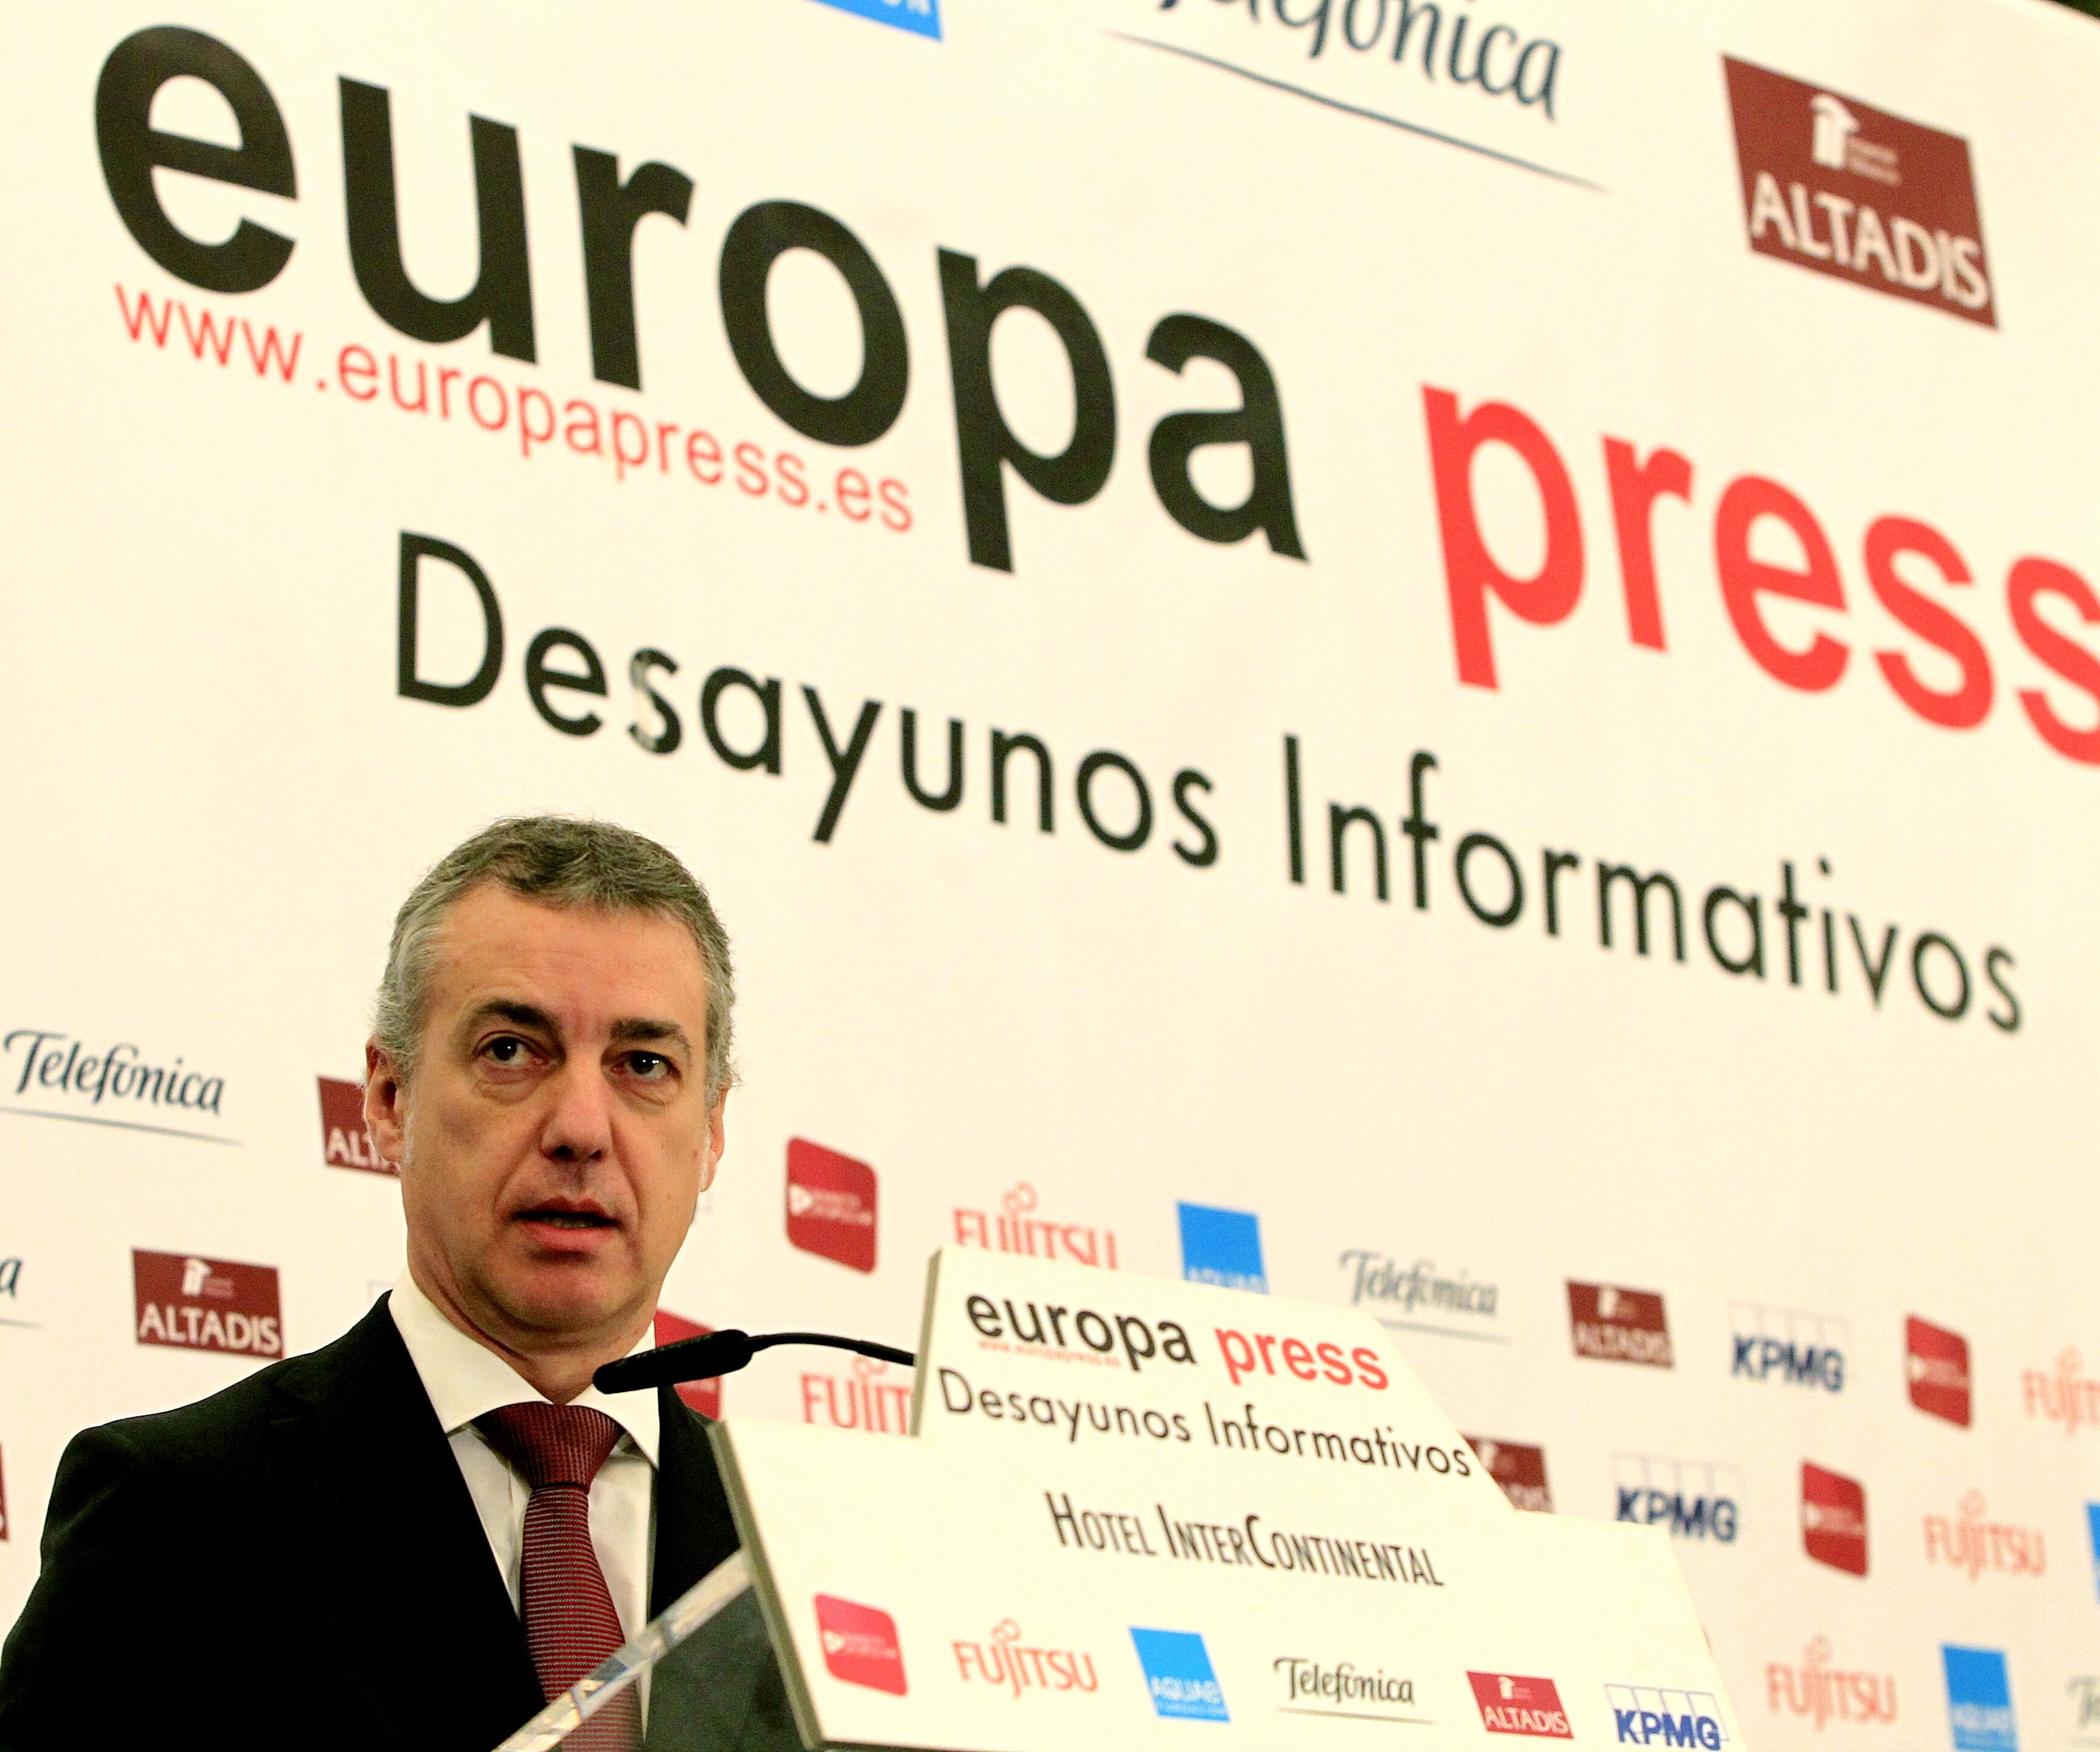 lhk_europa_press_06.jpg